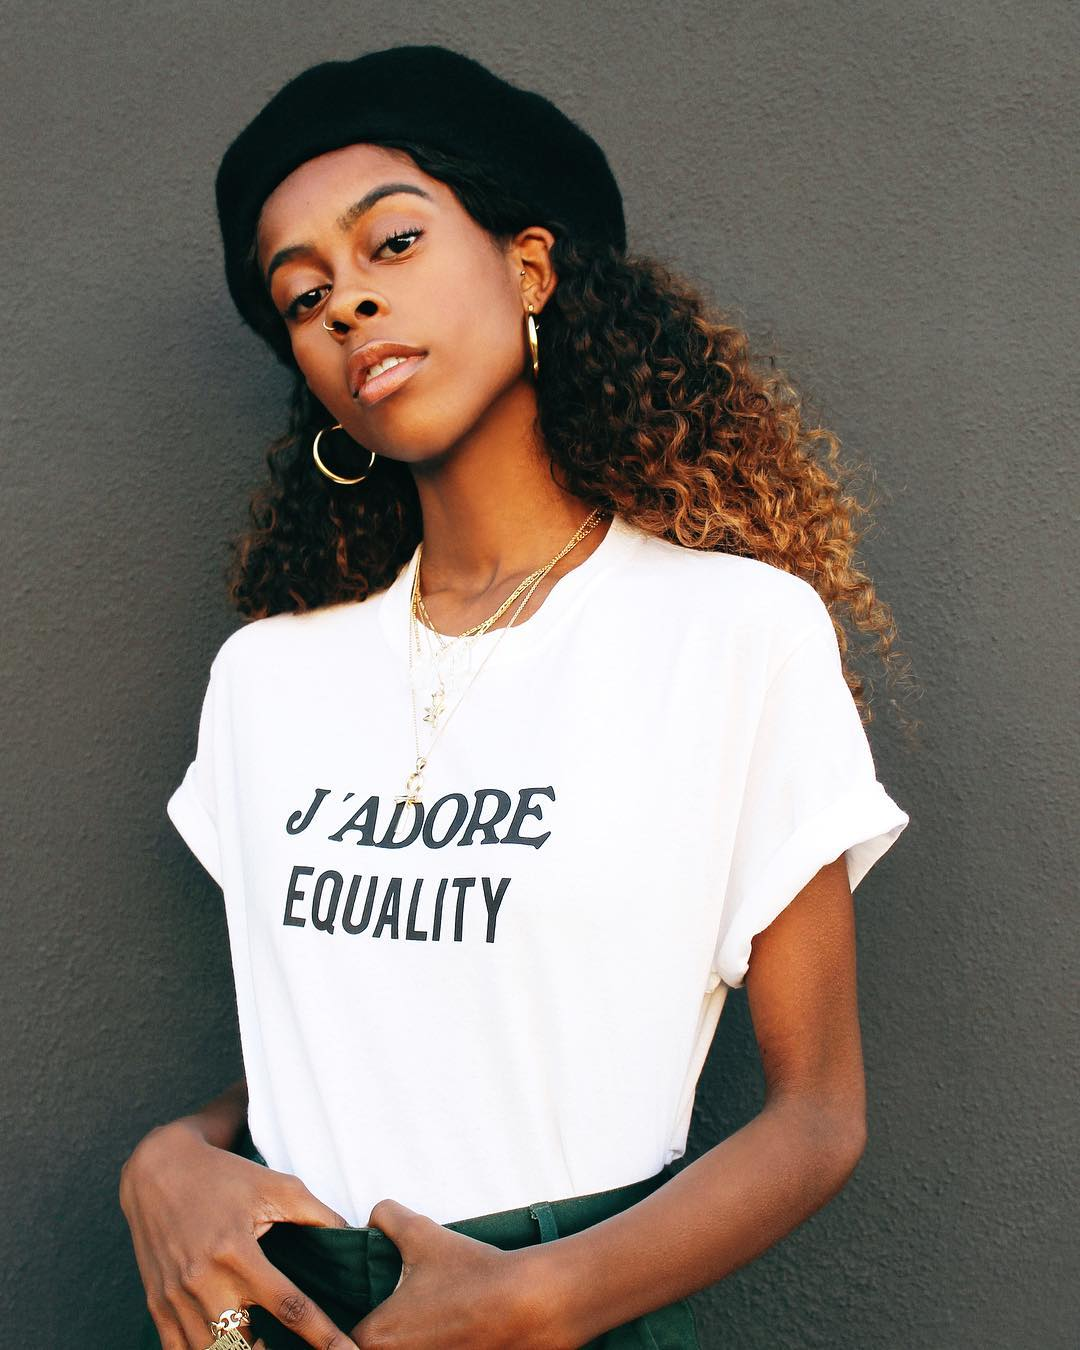 J'ADORE EQUALITY TEE